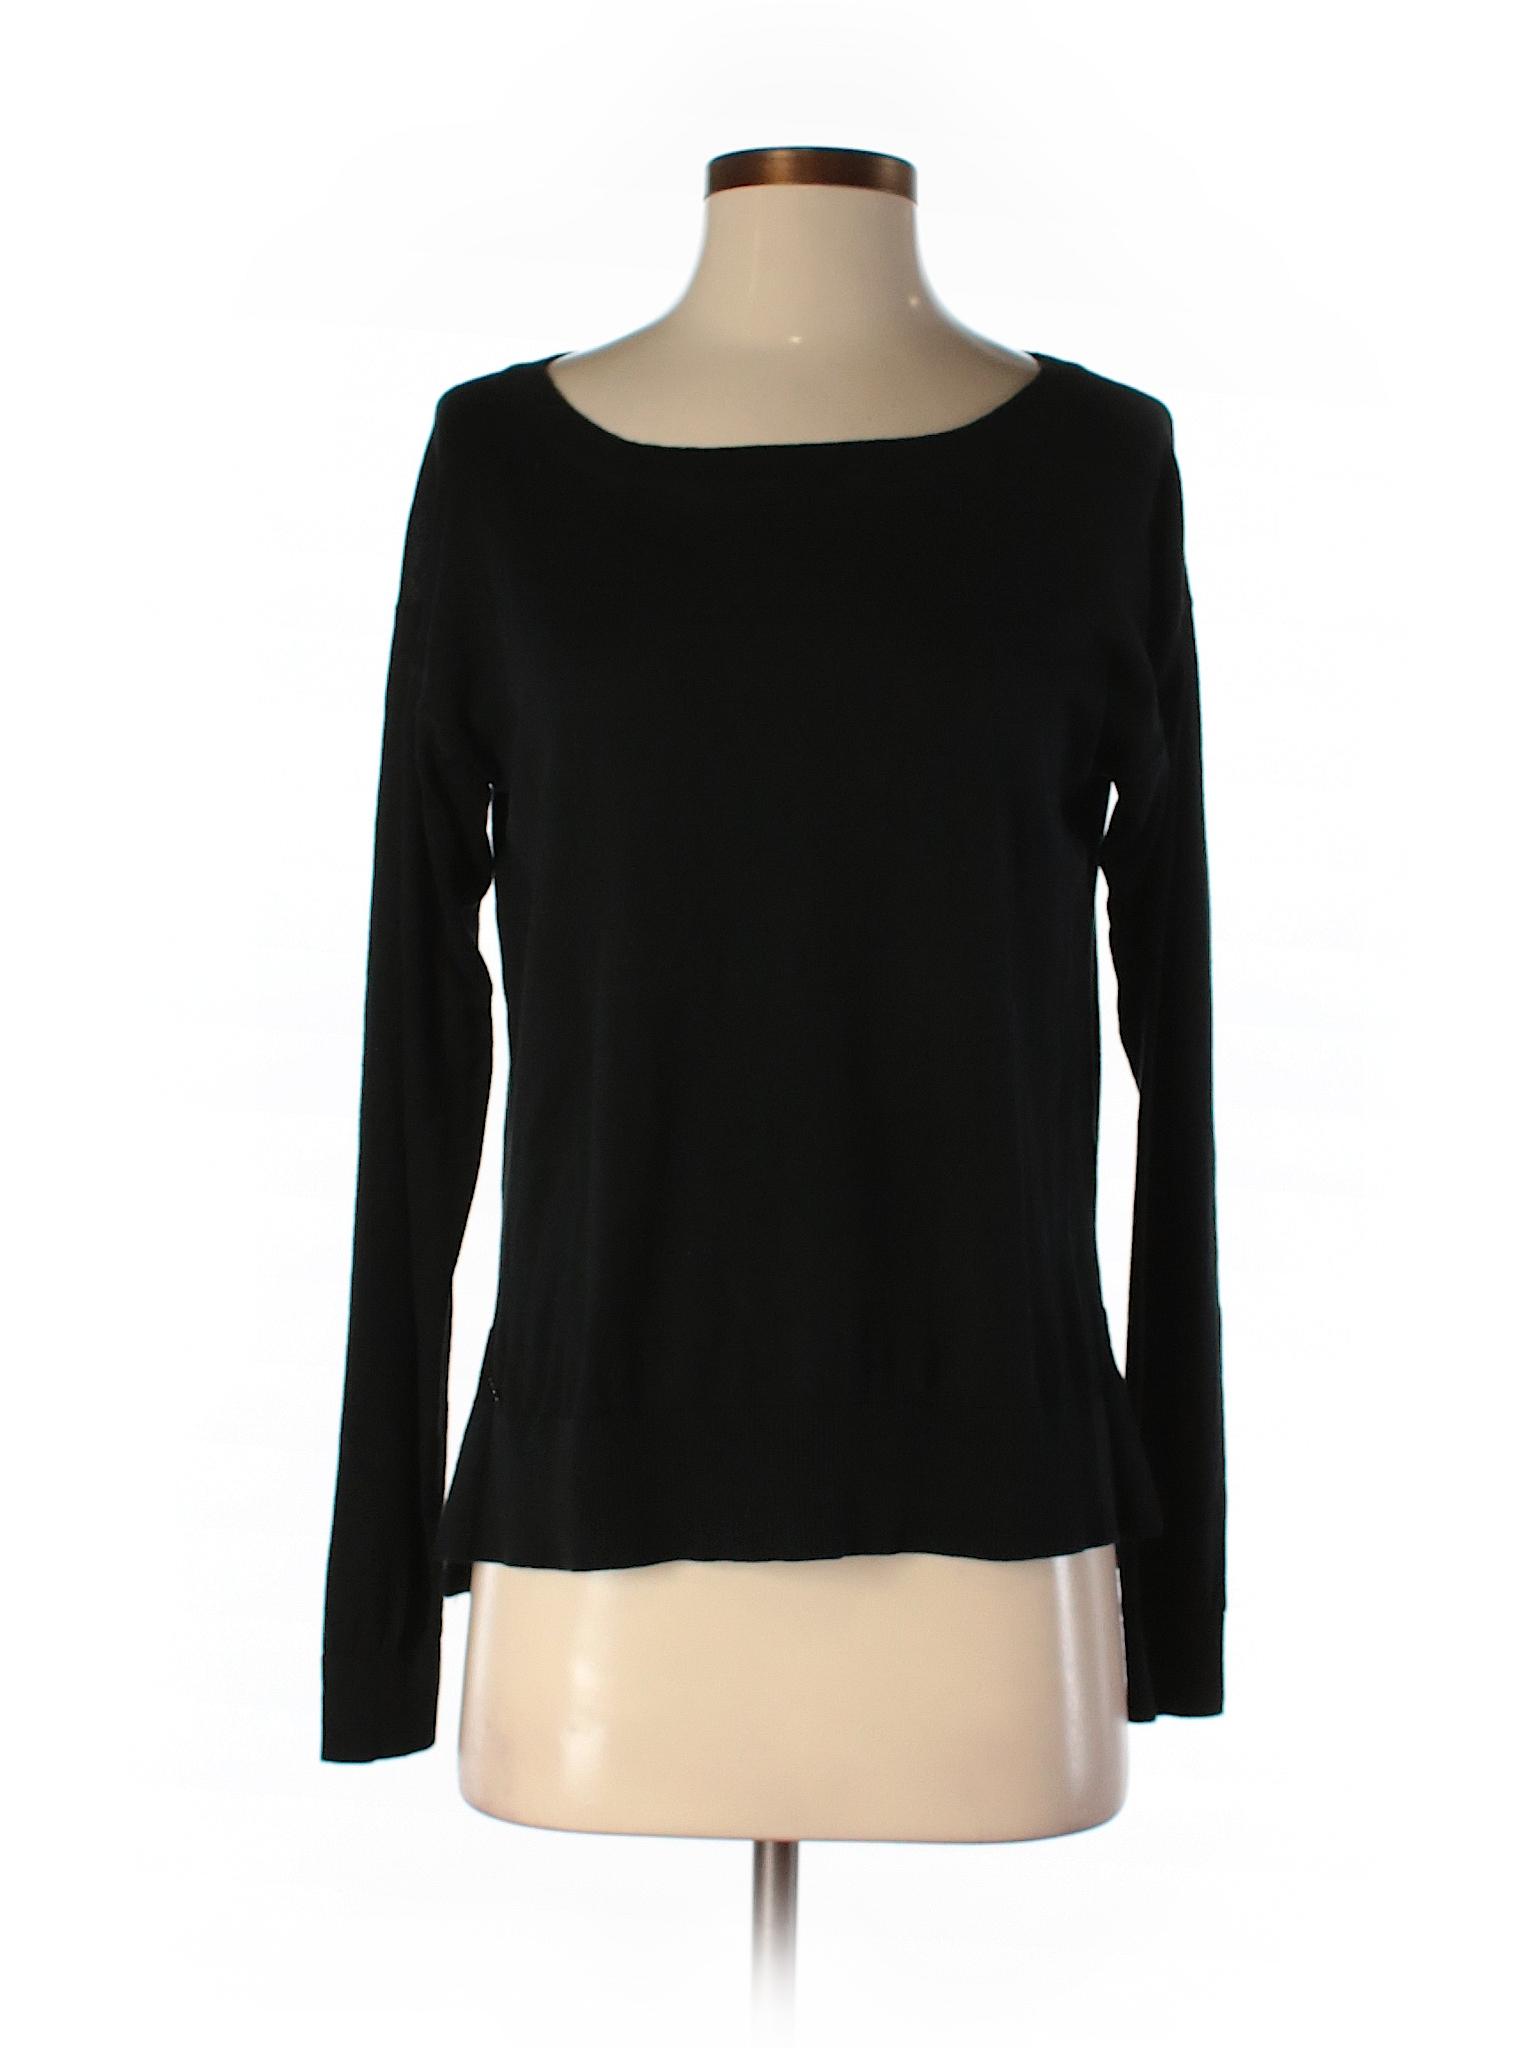 lacoste pullover sweater 74 off only on thredup. Black Bedroom Furniture Sets. Home Design Ideas